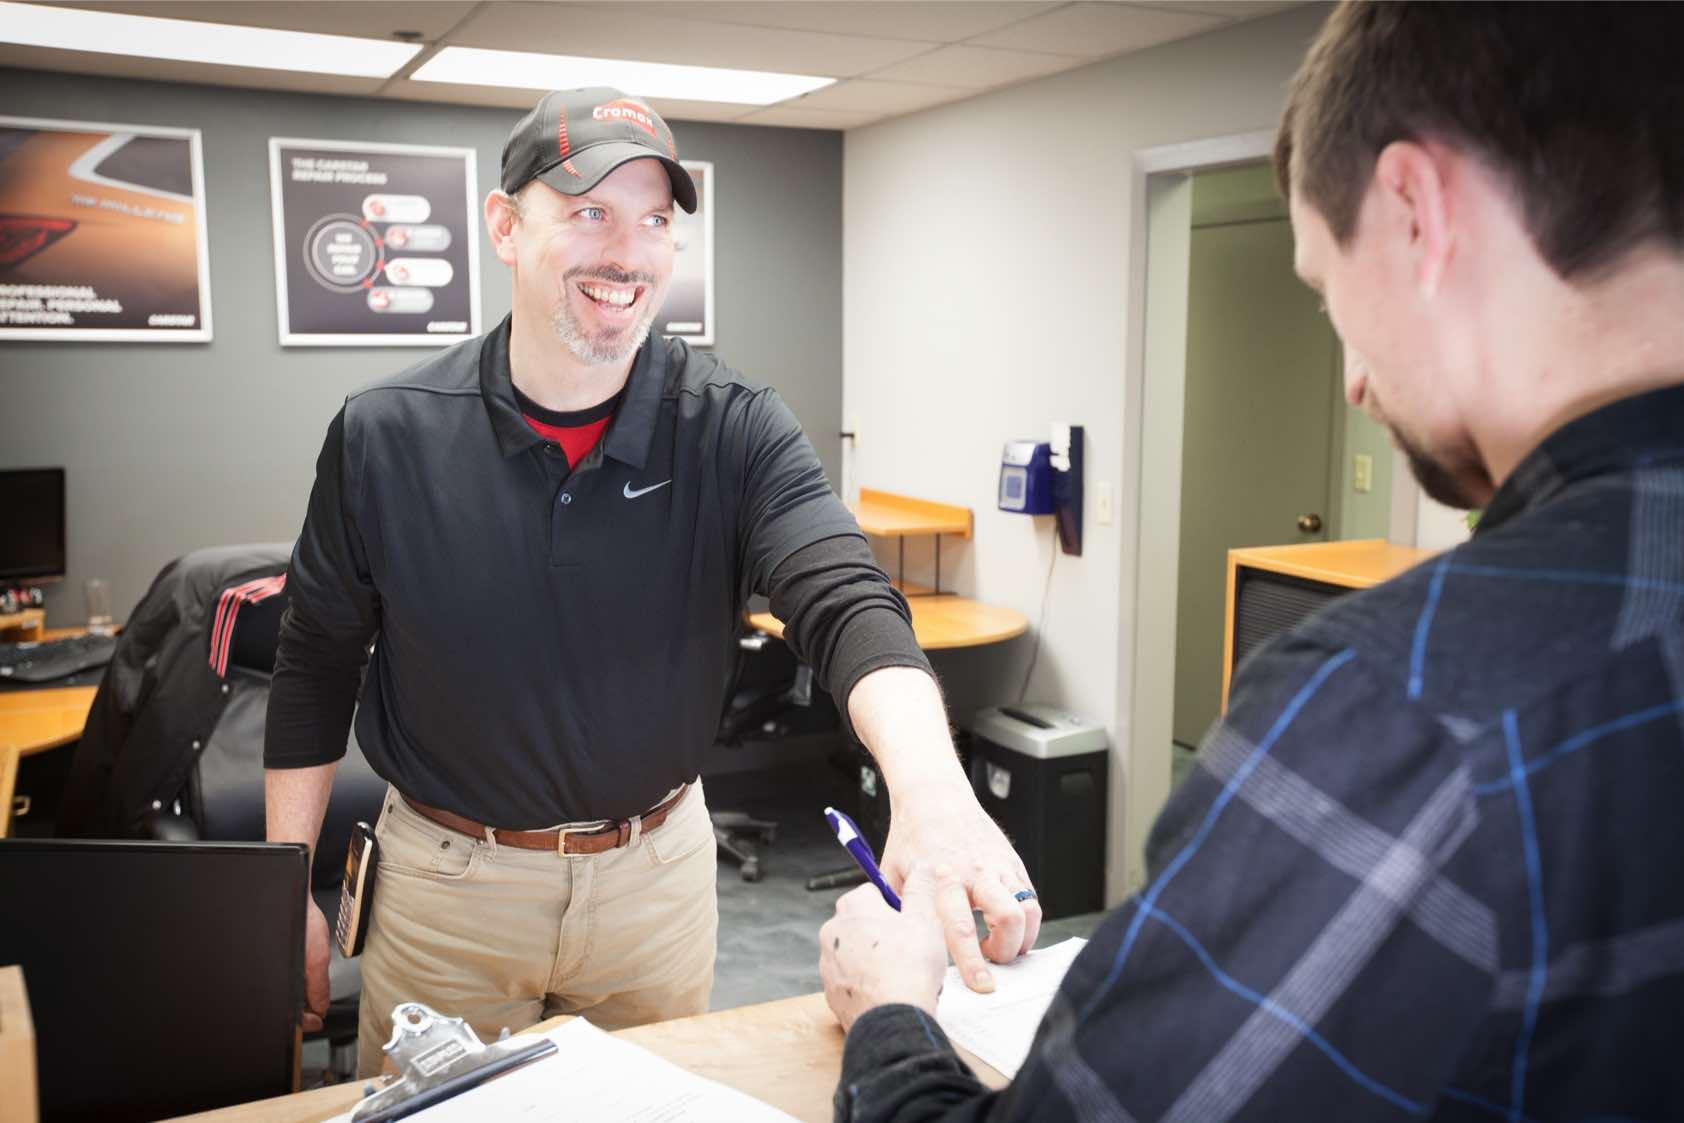 Jamie Schiele provides quality customer service